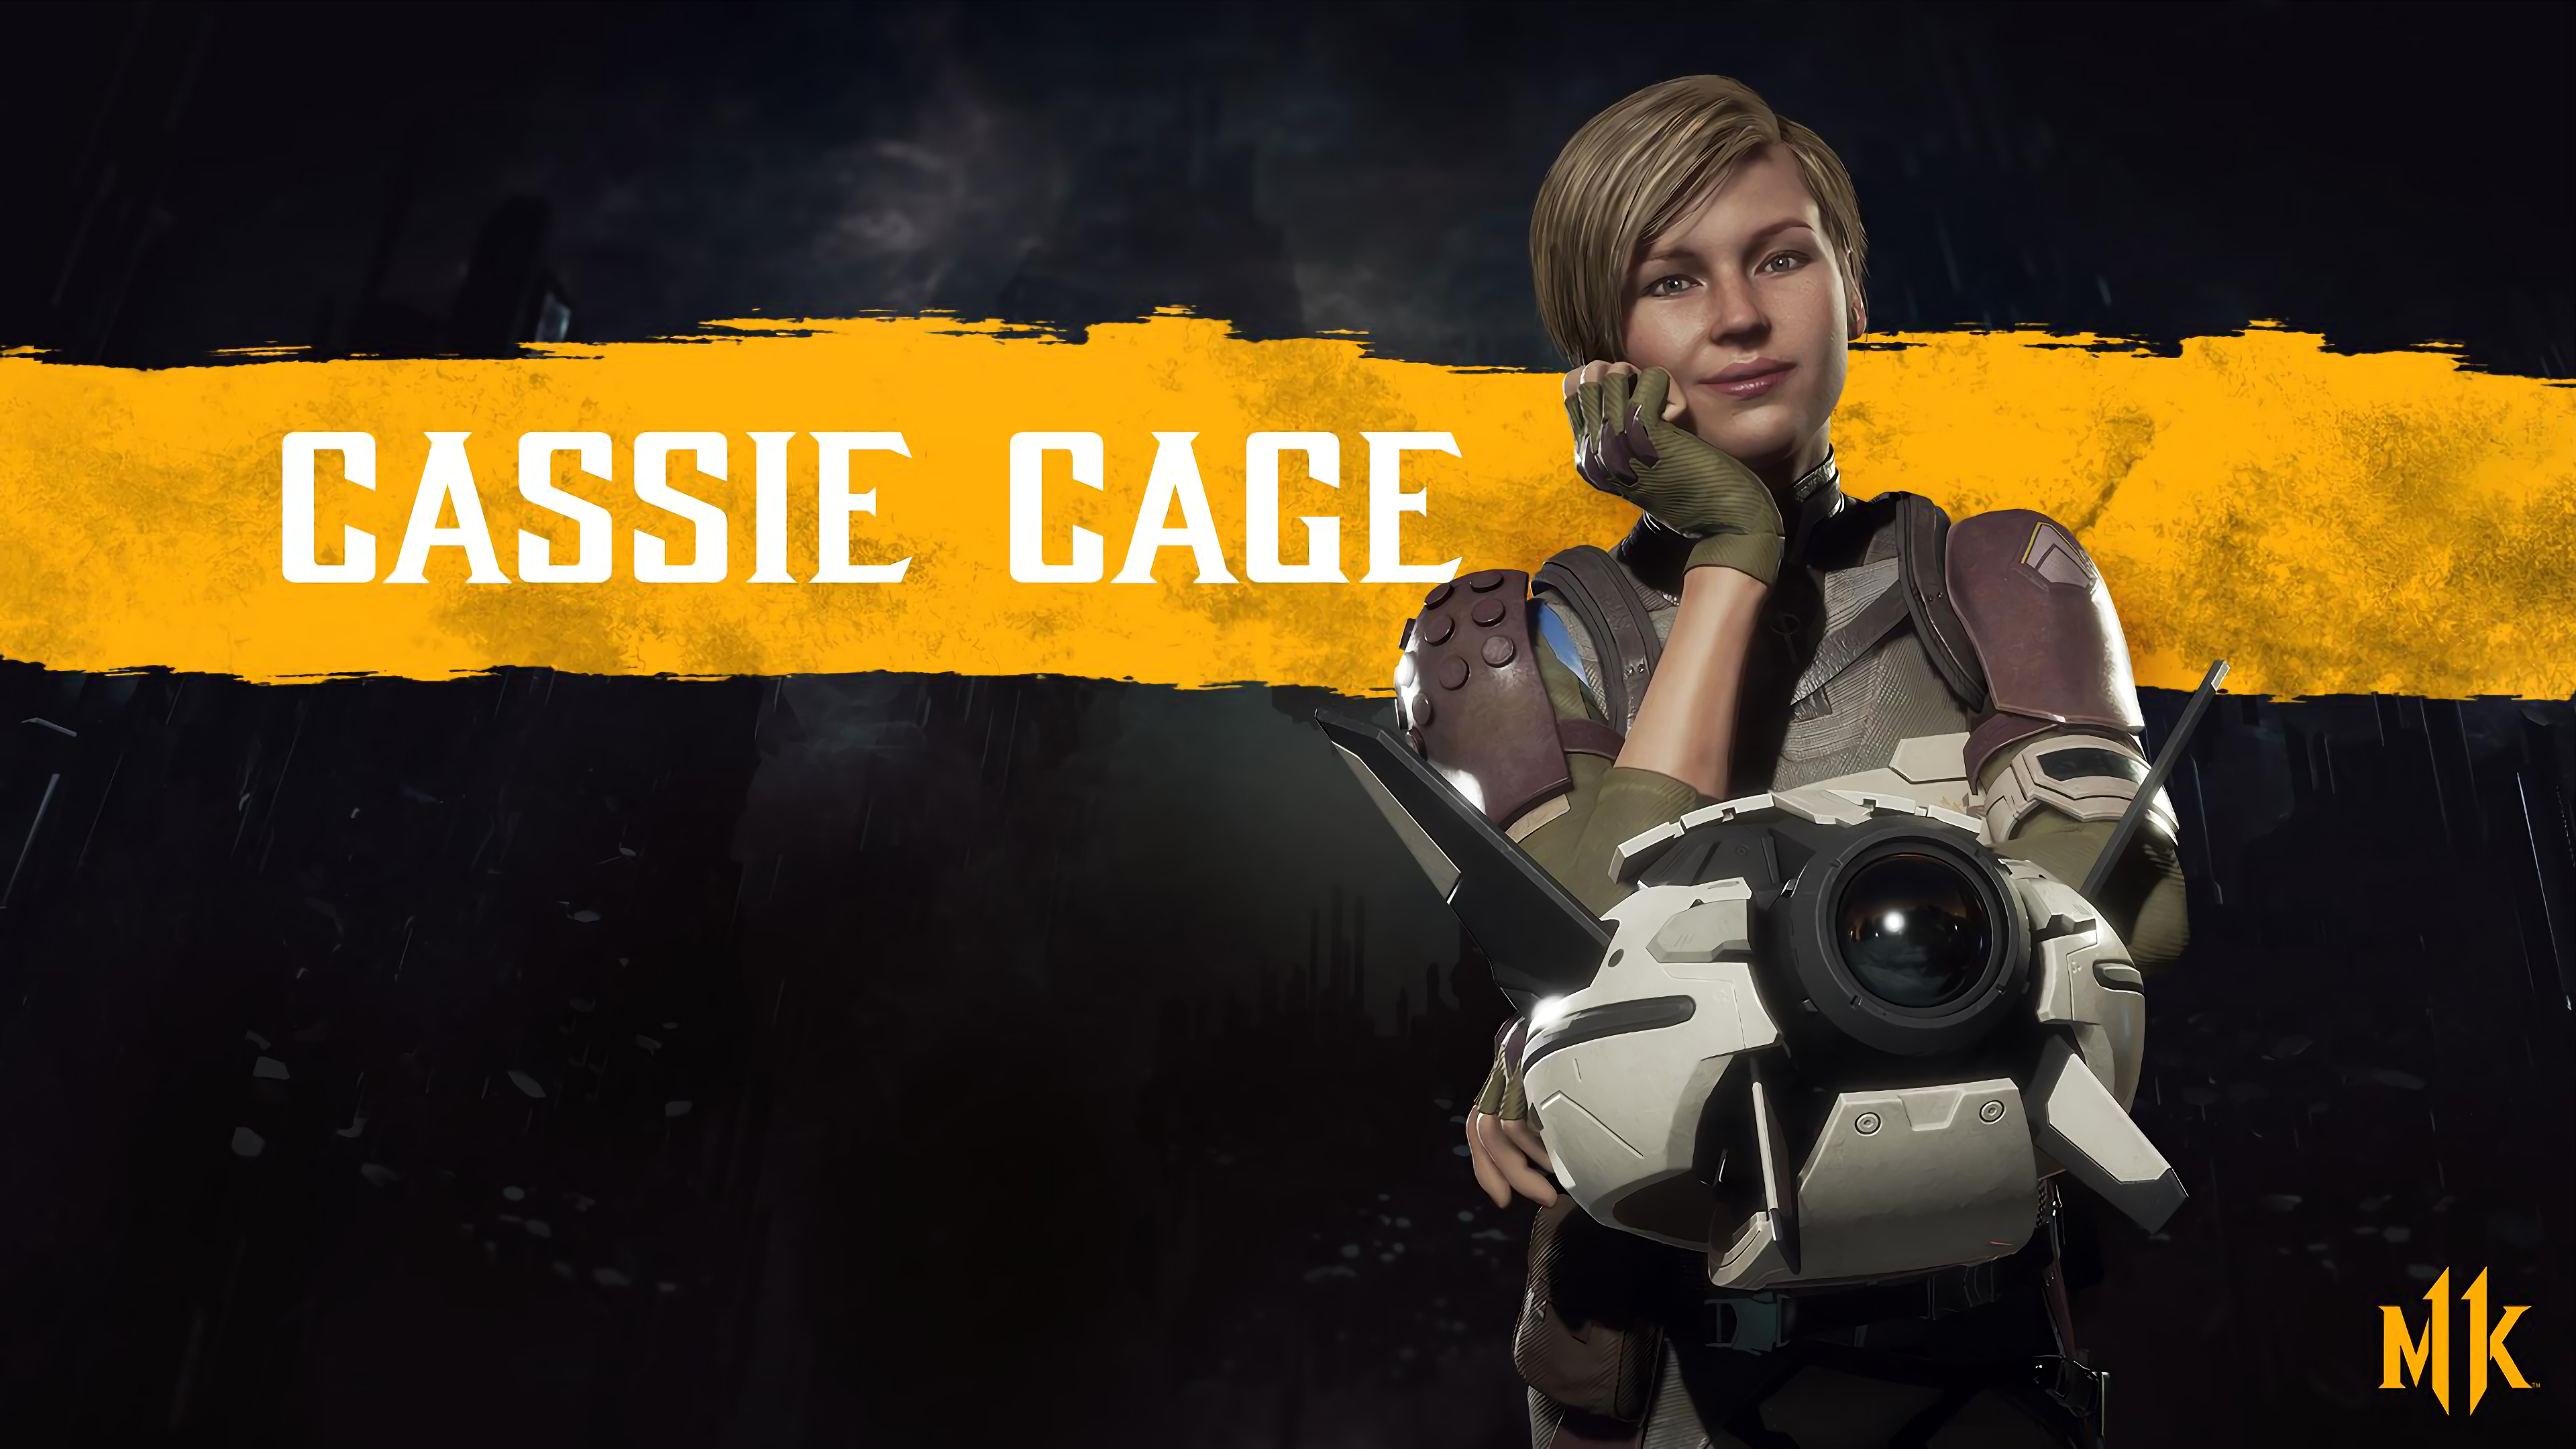 Cassie Cage Mortal Kombat 11 4k Wallpaper 31